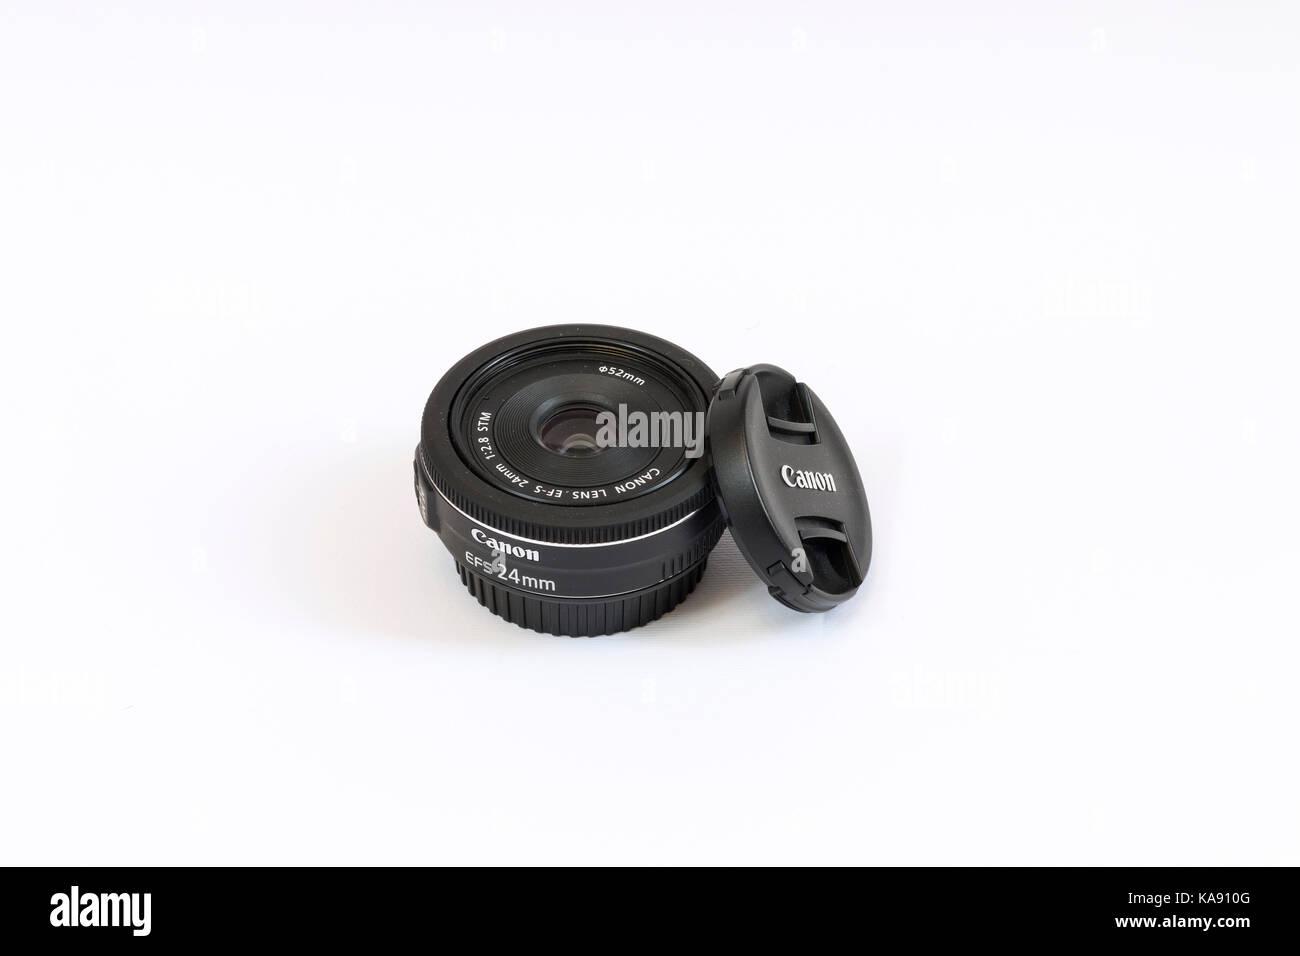 6f318b14e3 24mm Imágenes De Stock & 24mm Fotos De Stock - Alamy